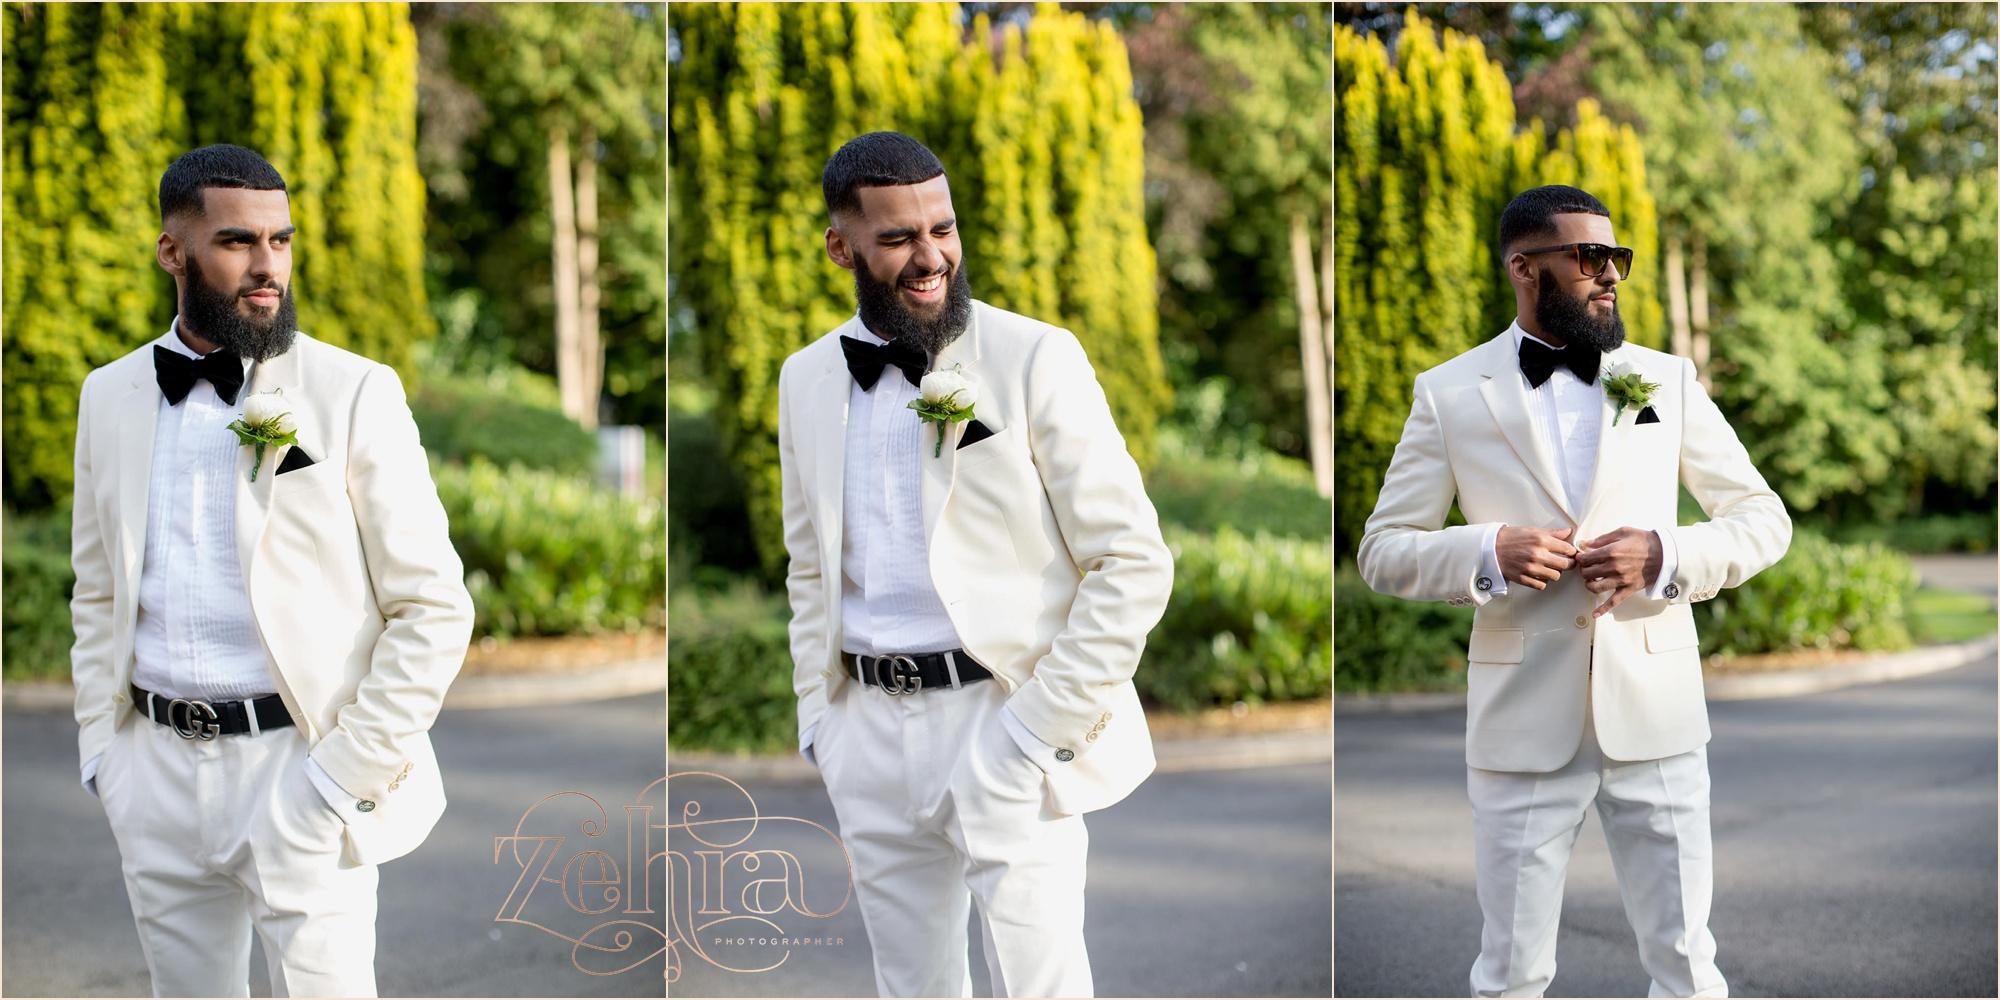 jasira manchester wedding photographer_0030.jpg